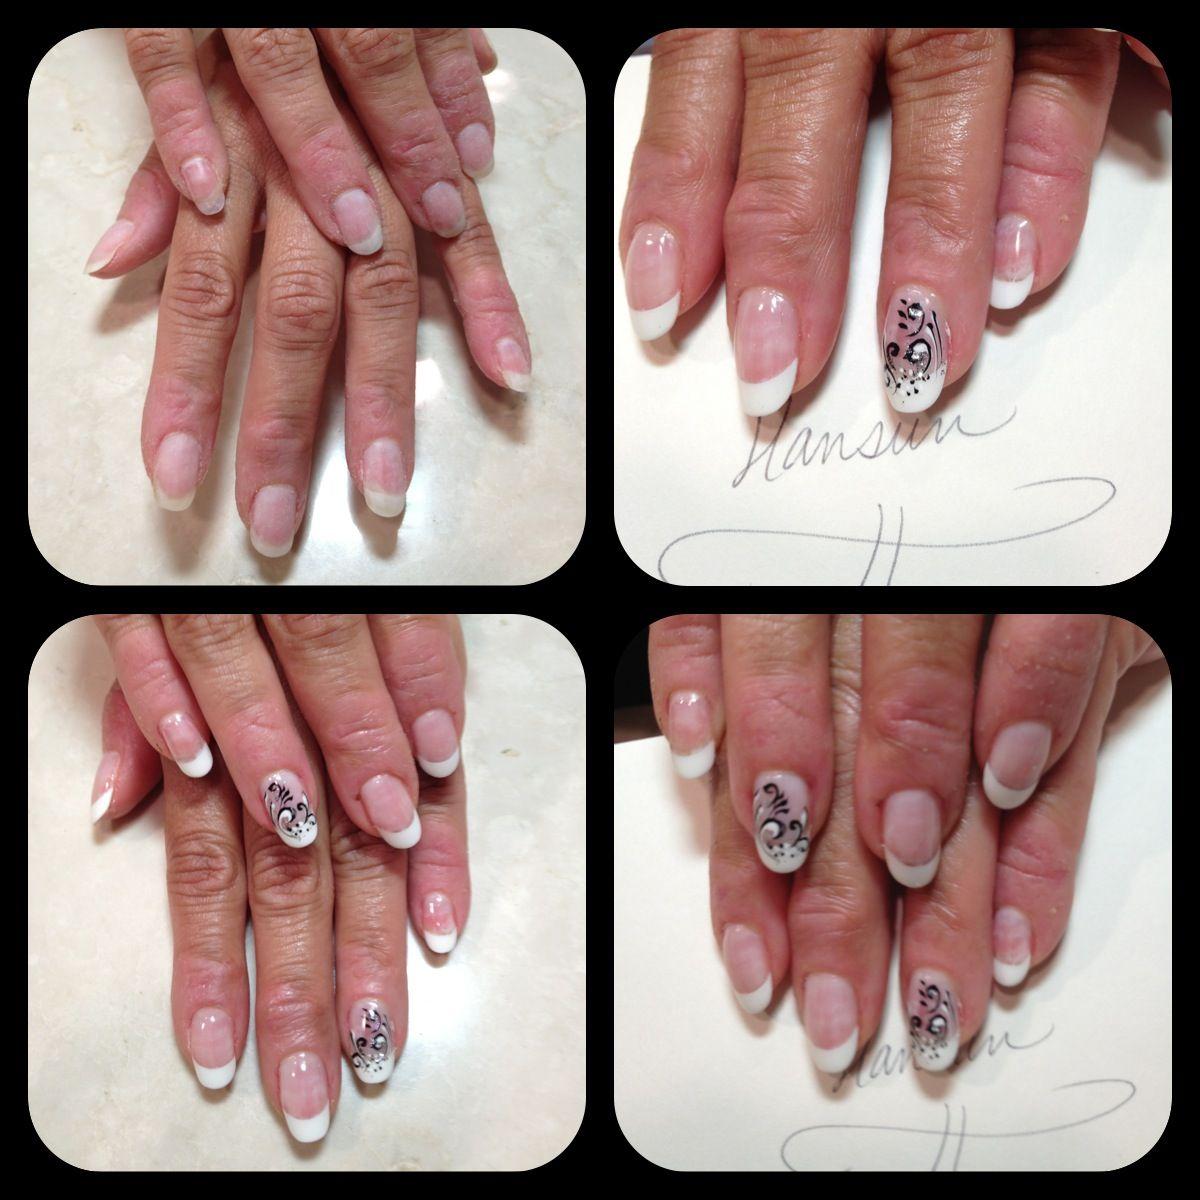 nail art by Hansun (Reston) | Nail services, Spa day, Spa ...